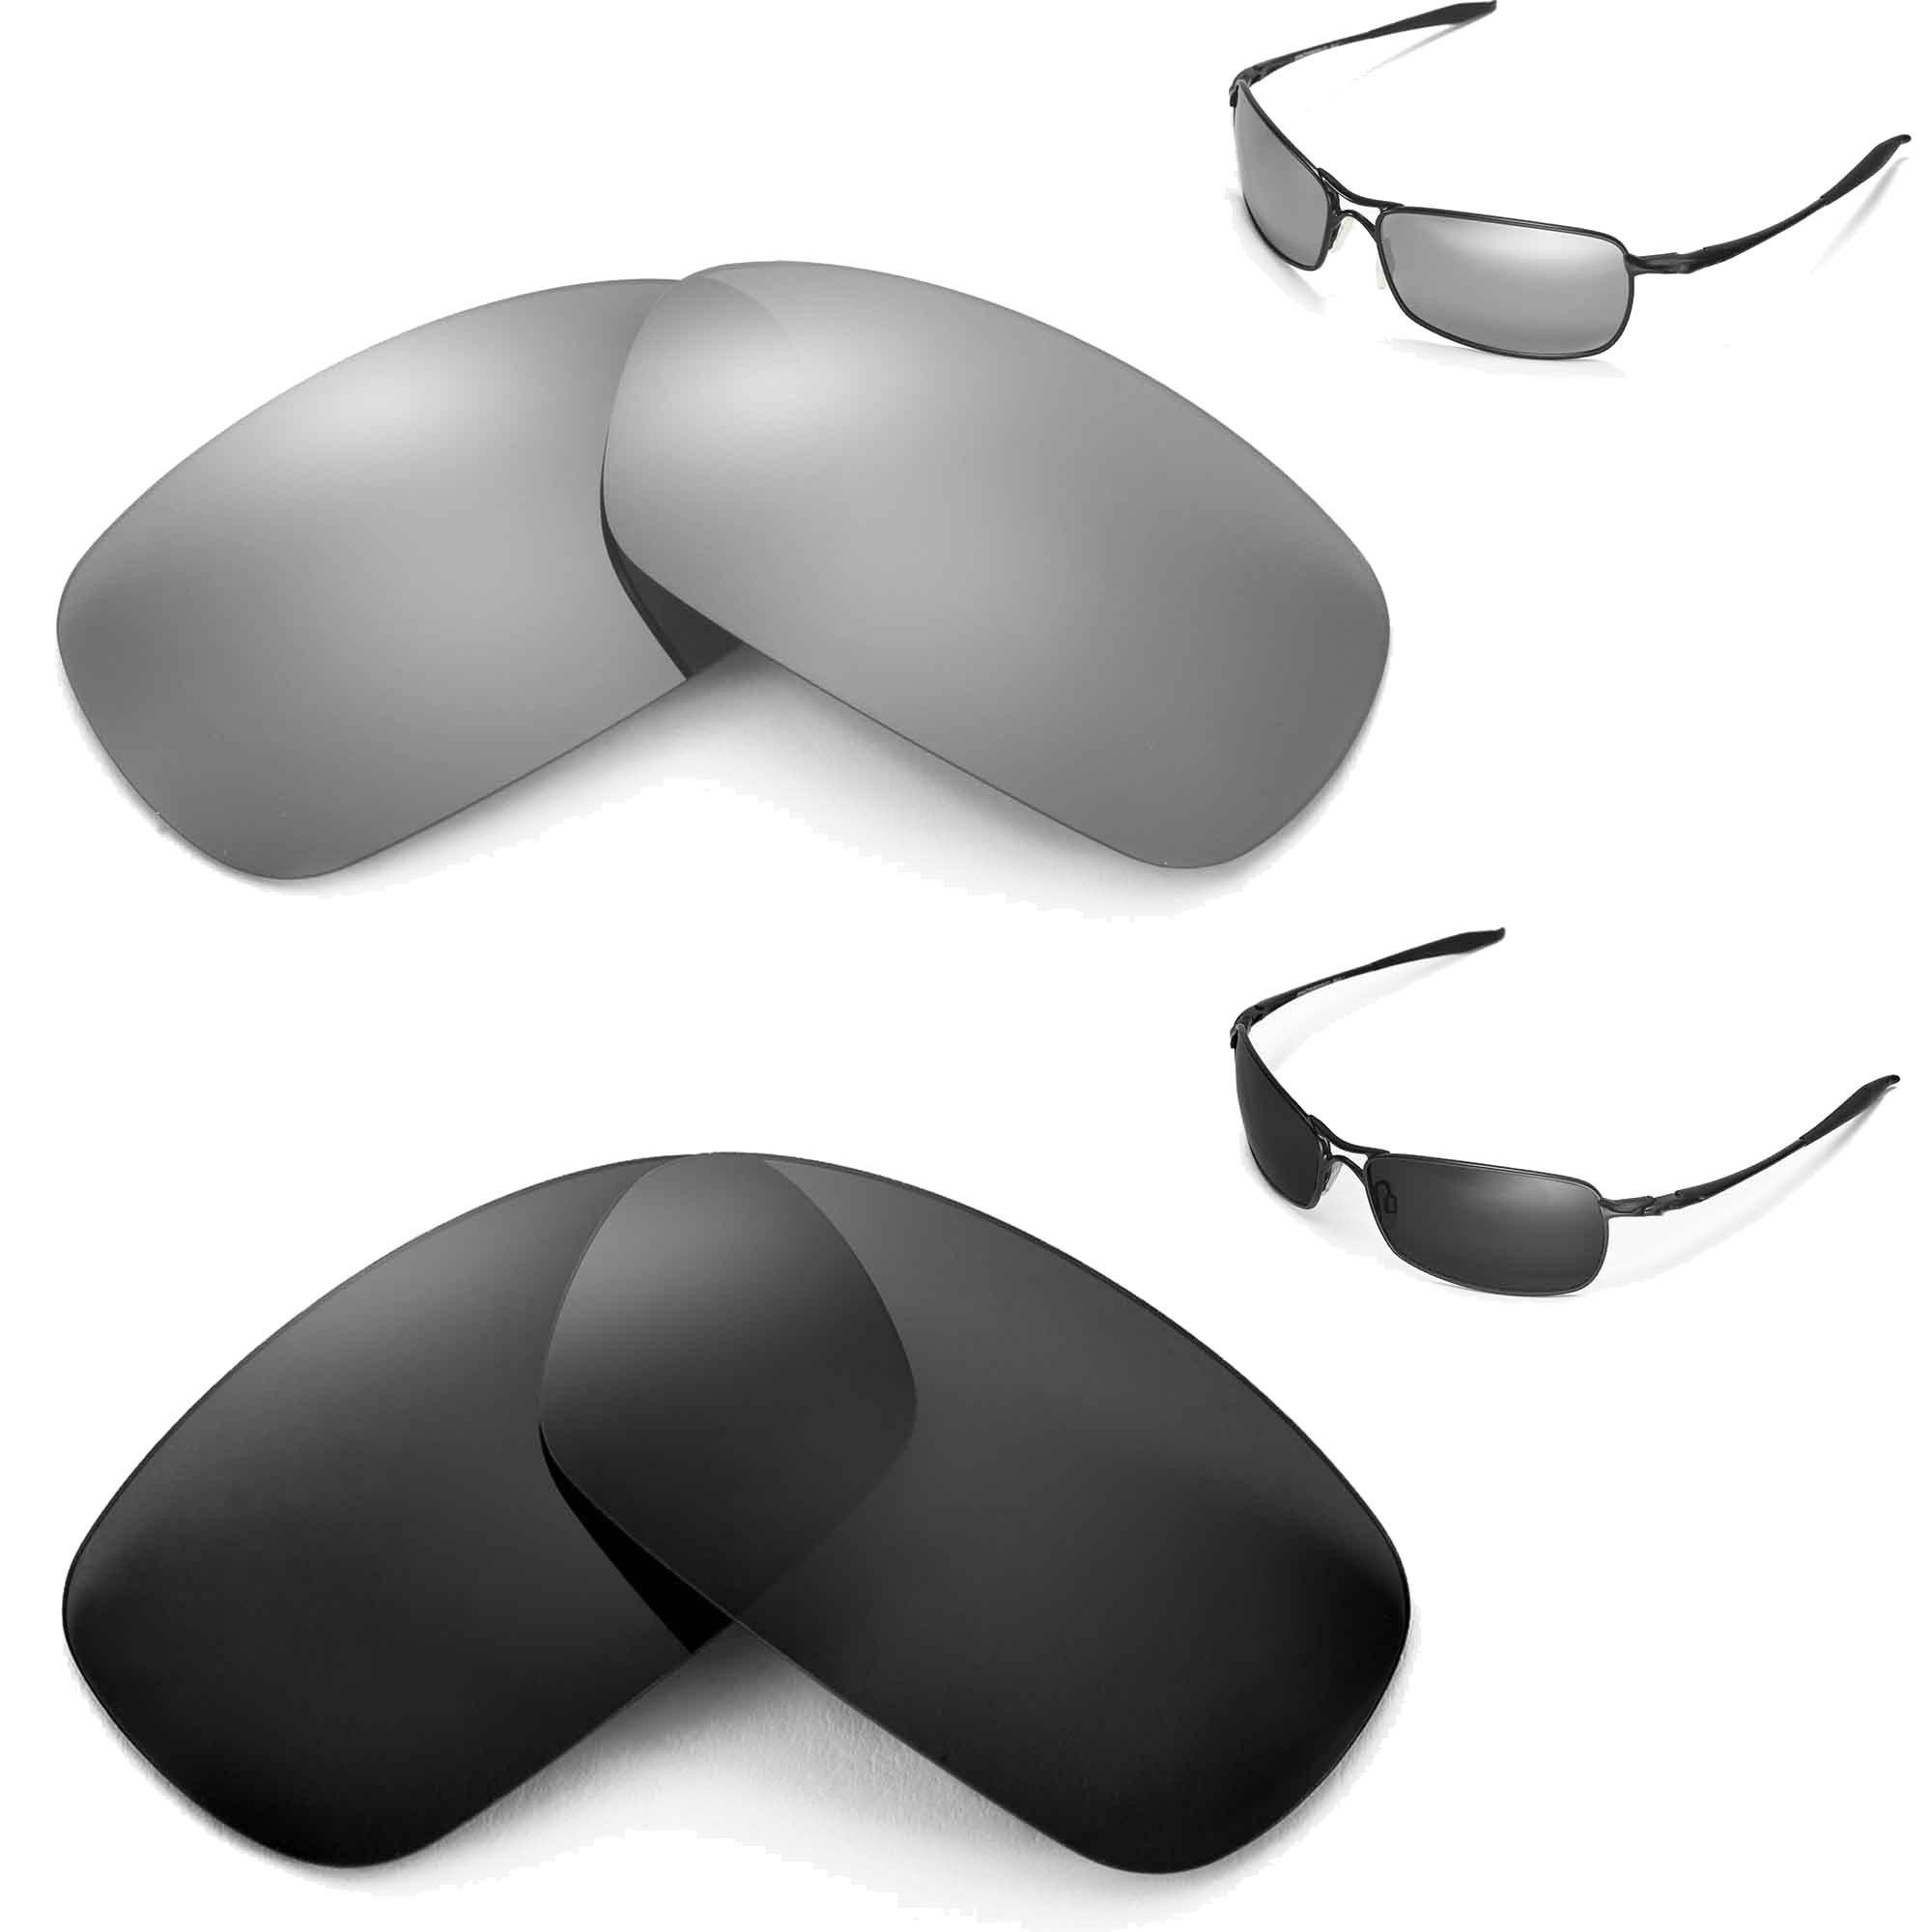 New Walleva Polarized Black + Titanium Lenses For Oakley Crosshair 2.0 (2010 version)